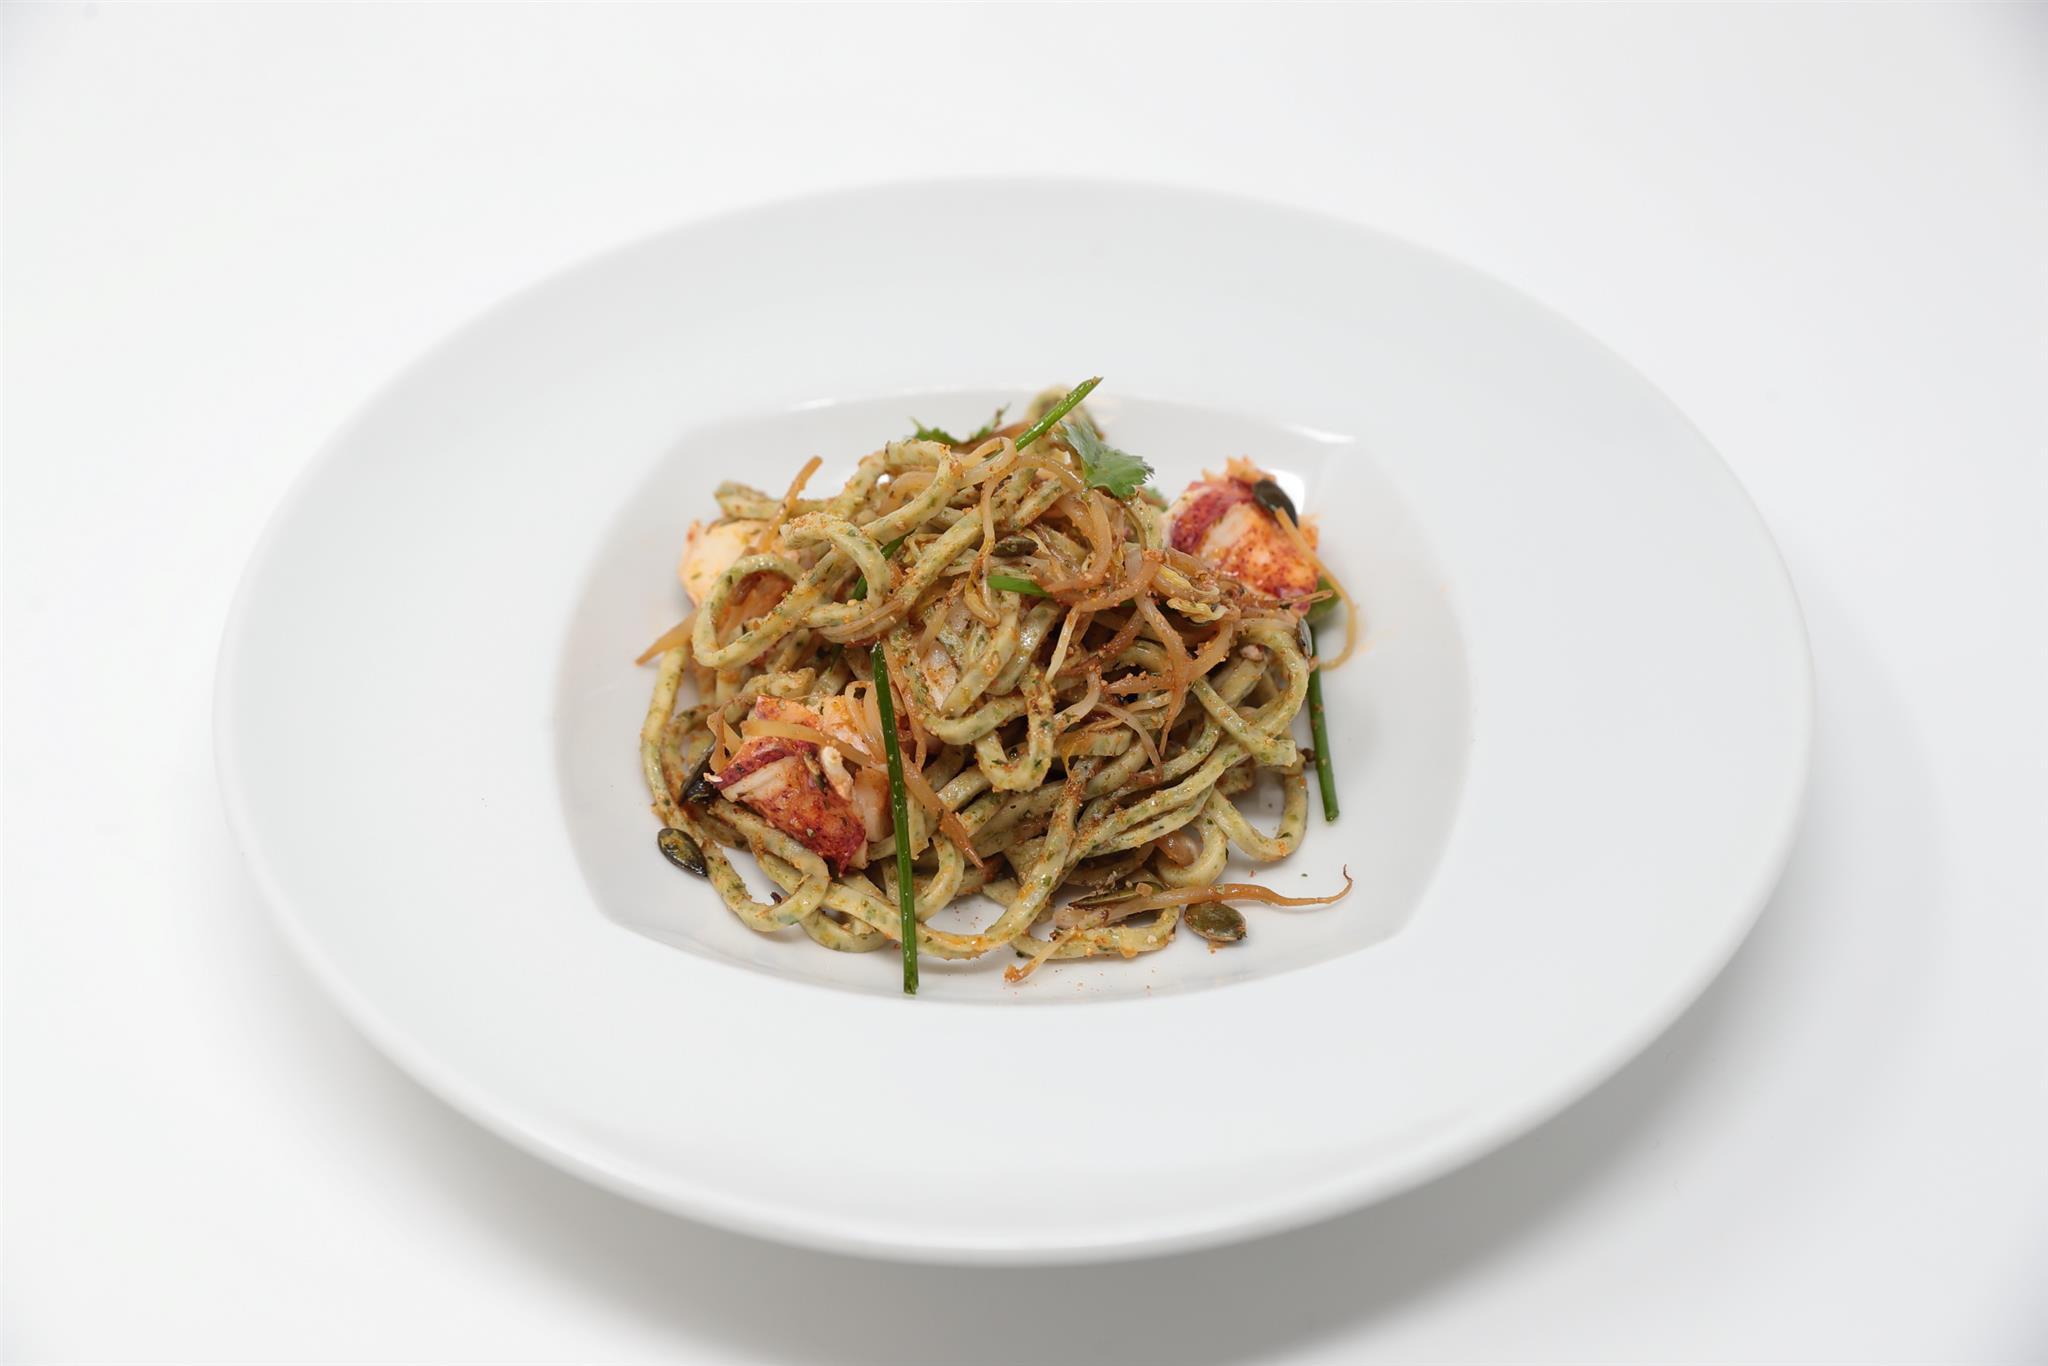 daruma-seasons-chef-barbieri-estate-2018-insalata-spaghetti